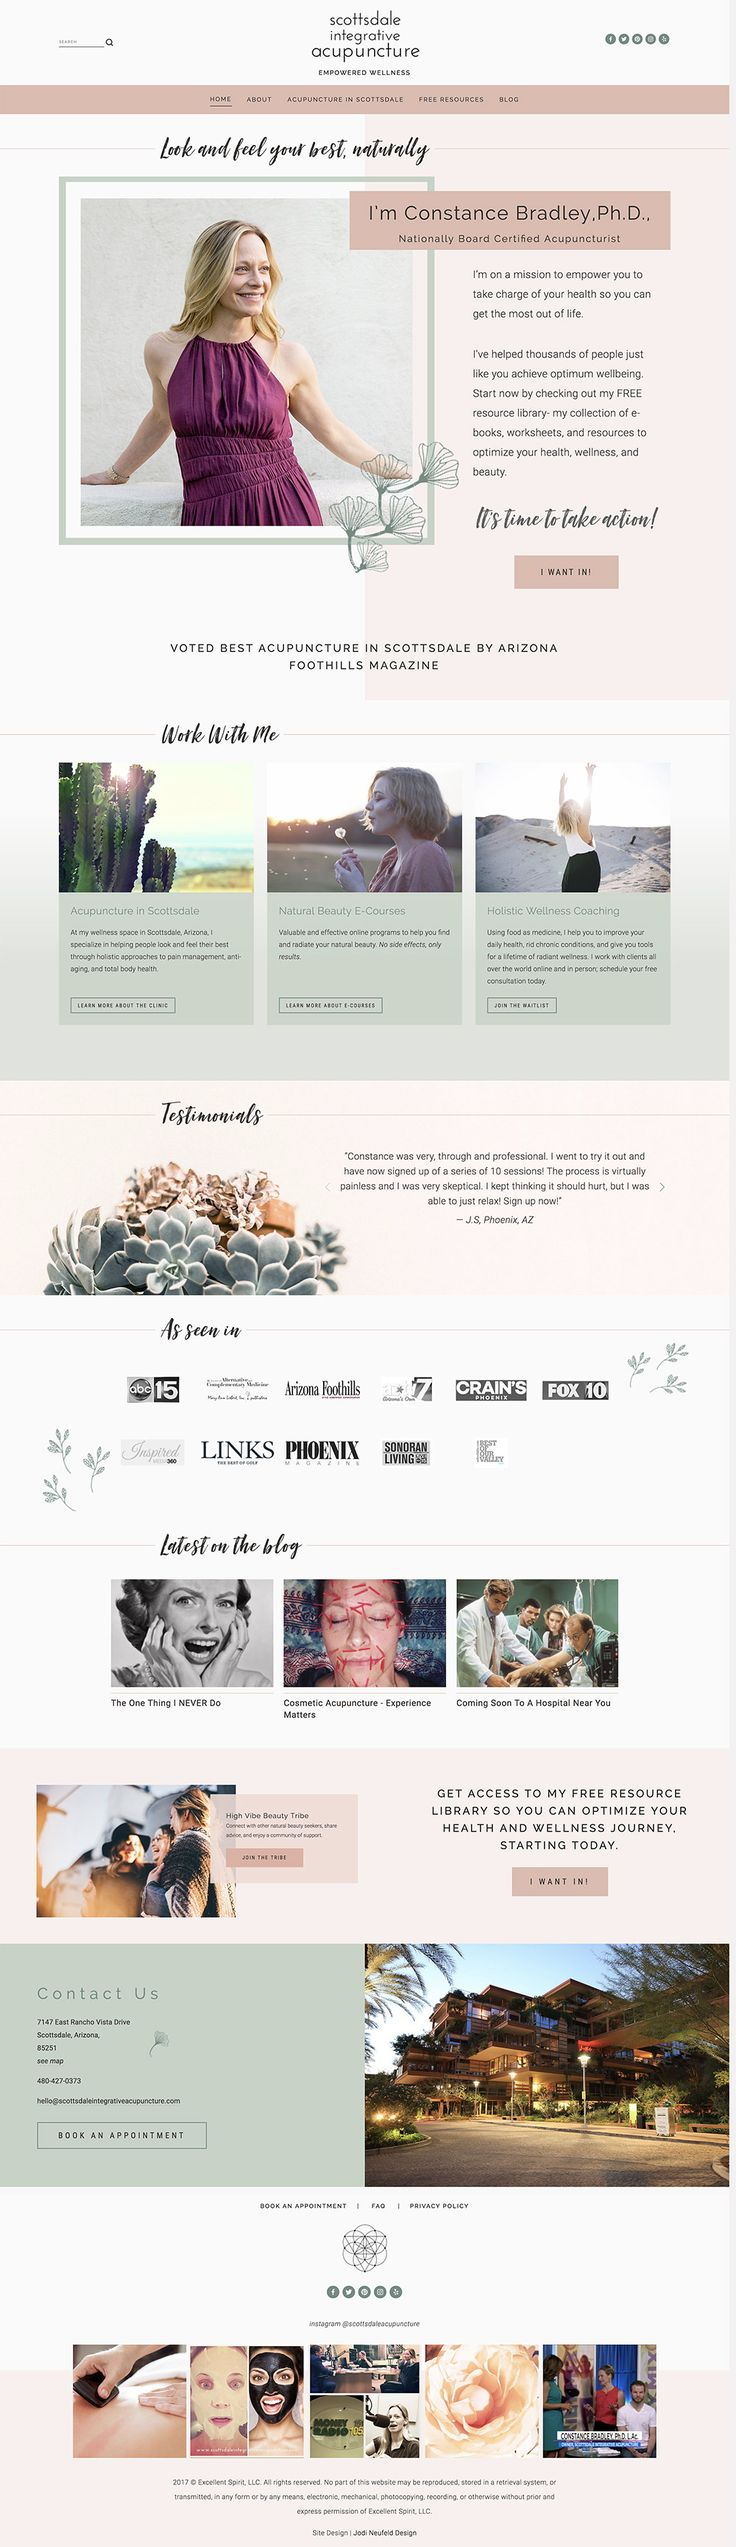 Squarespace web design | Home page for Acupuncture site | Jodi Neufeld Design | acupuncture website | webdesign for acupuncture studio